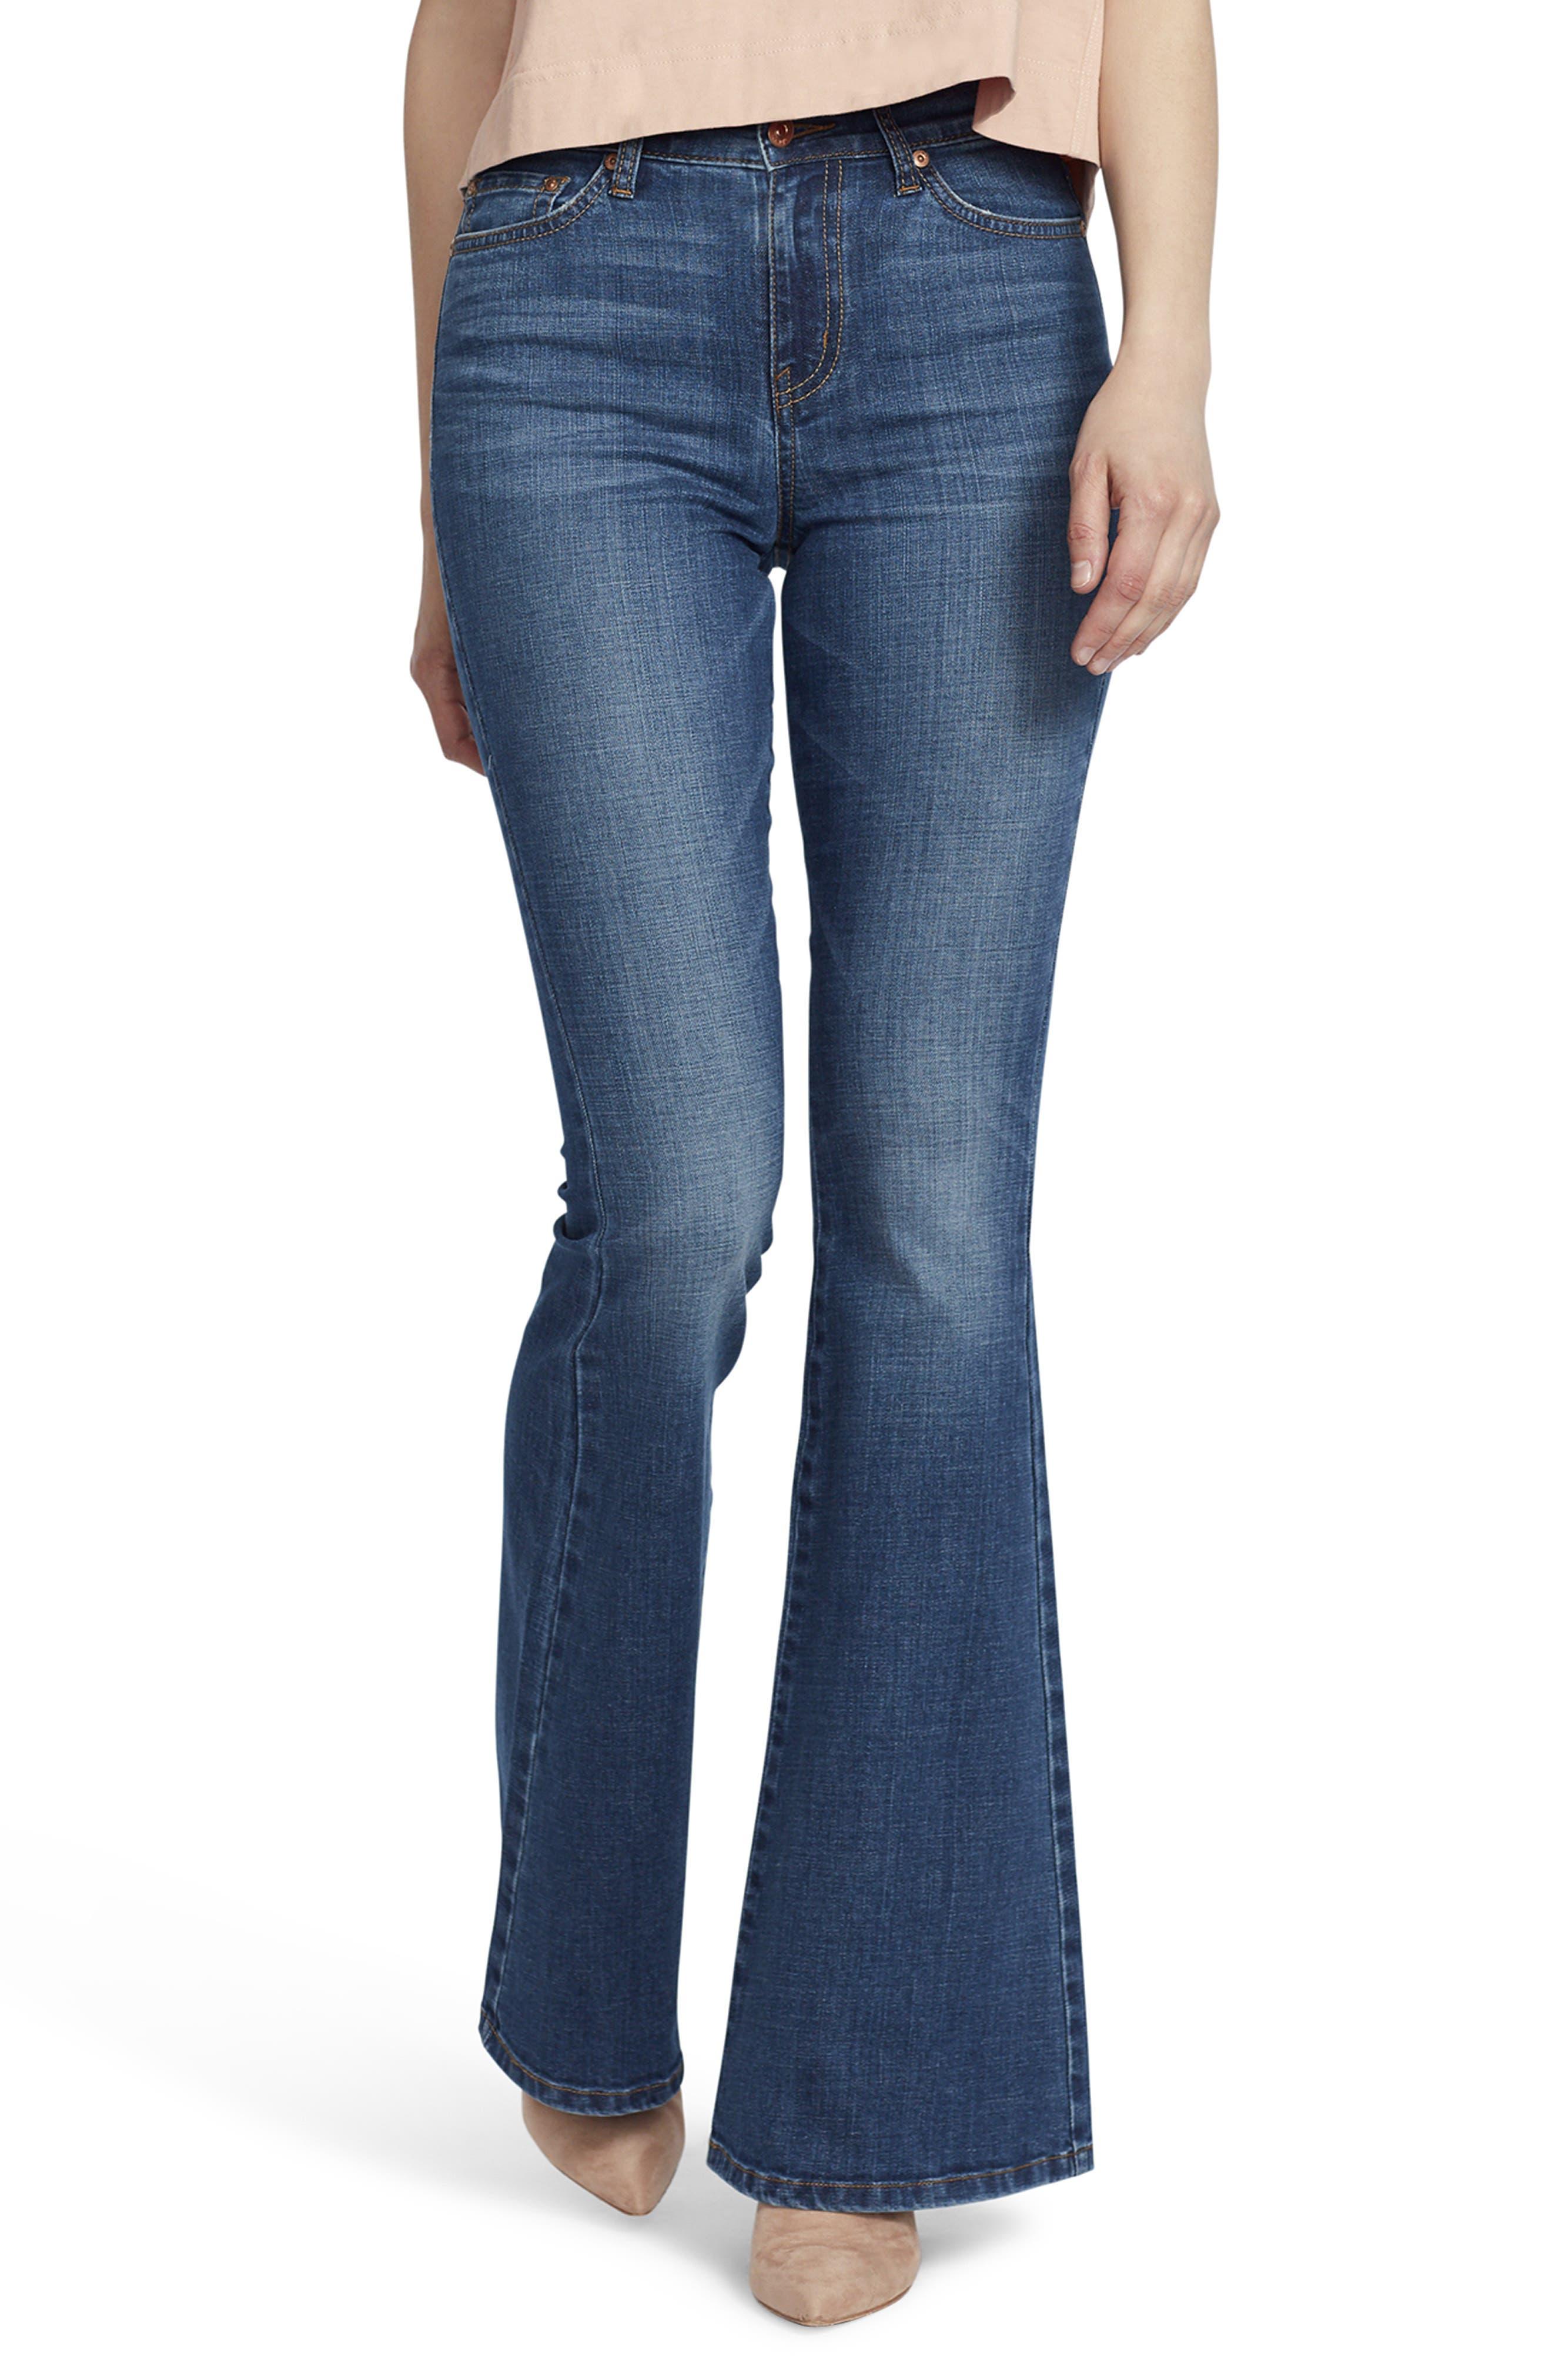 Ella Moss High Waist Flare Jeans (Naomi)